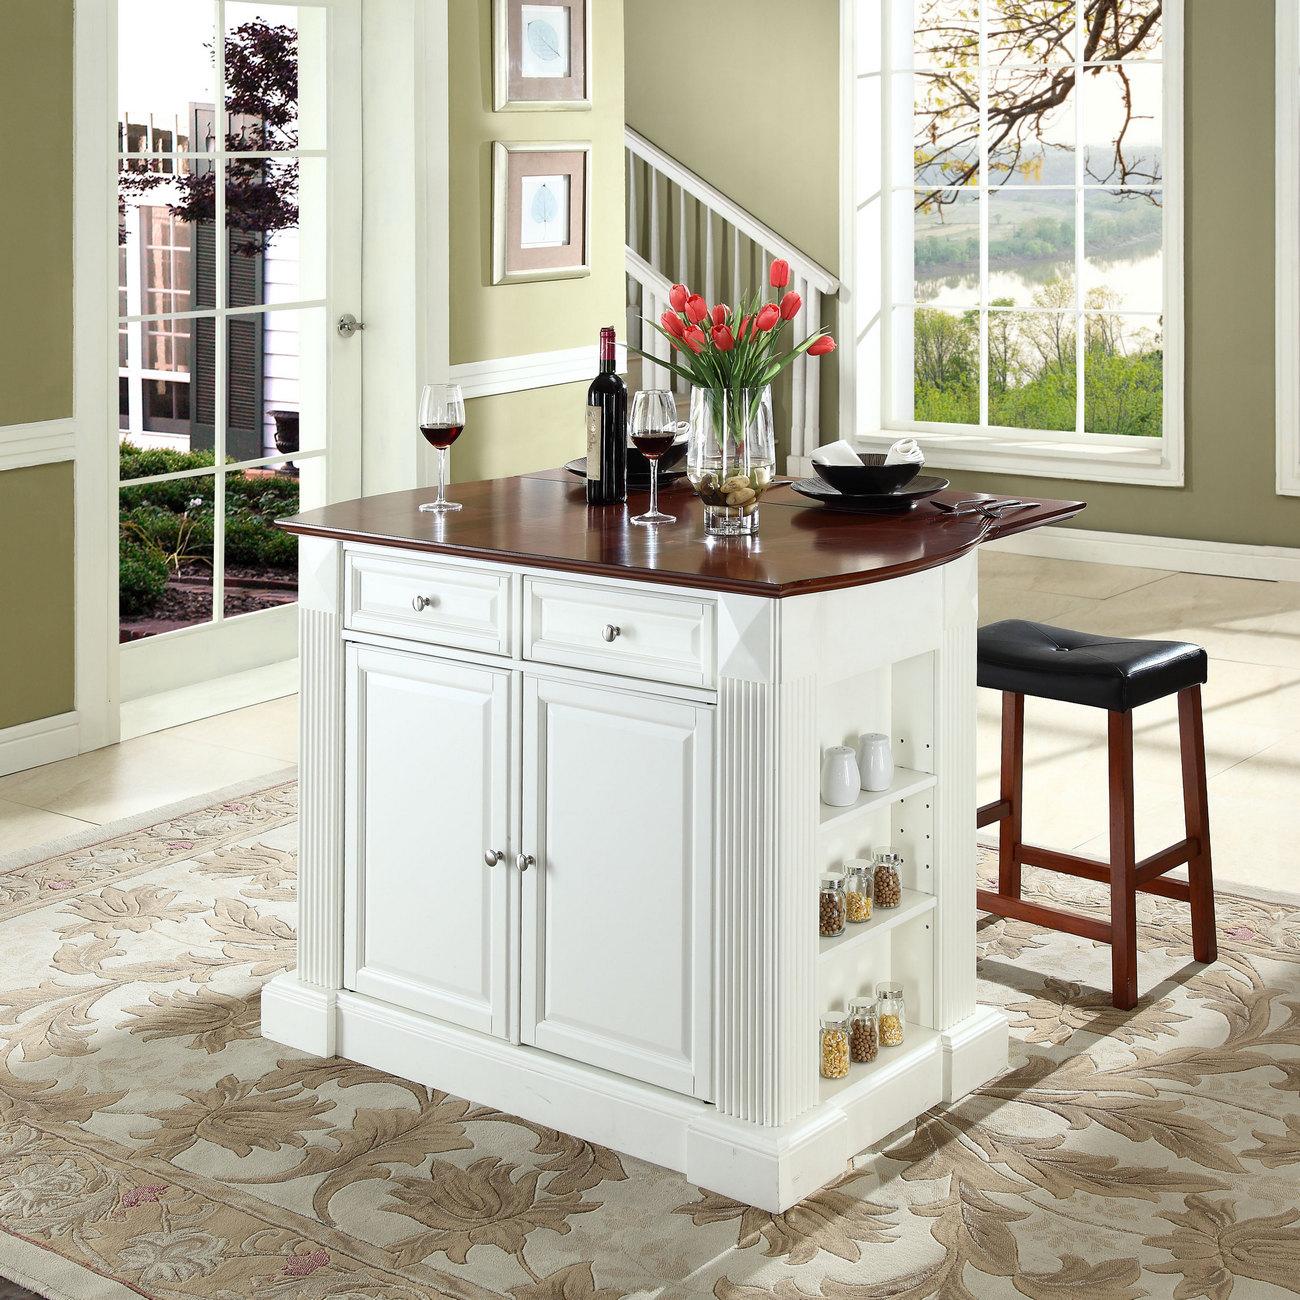 Crosley Brands Coventry Drop Leaf Breakfast Bar Kitchen Island White